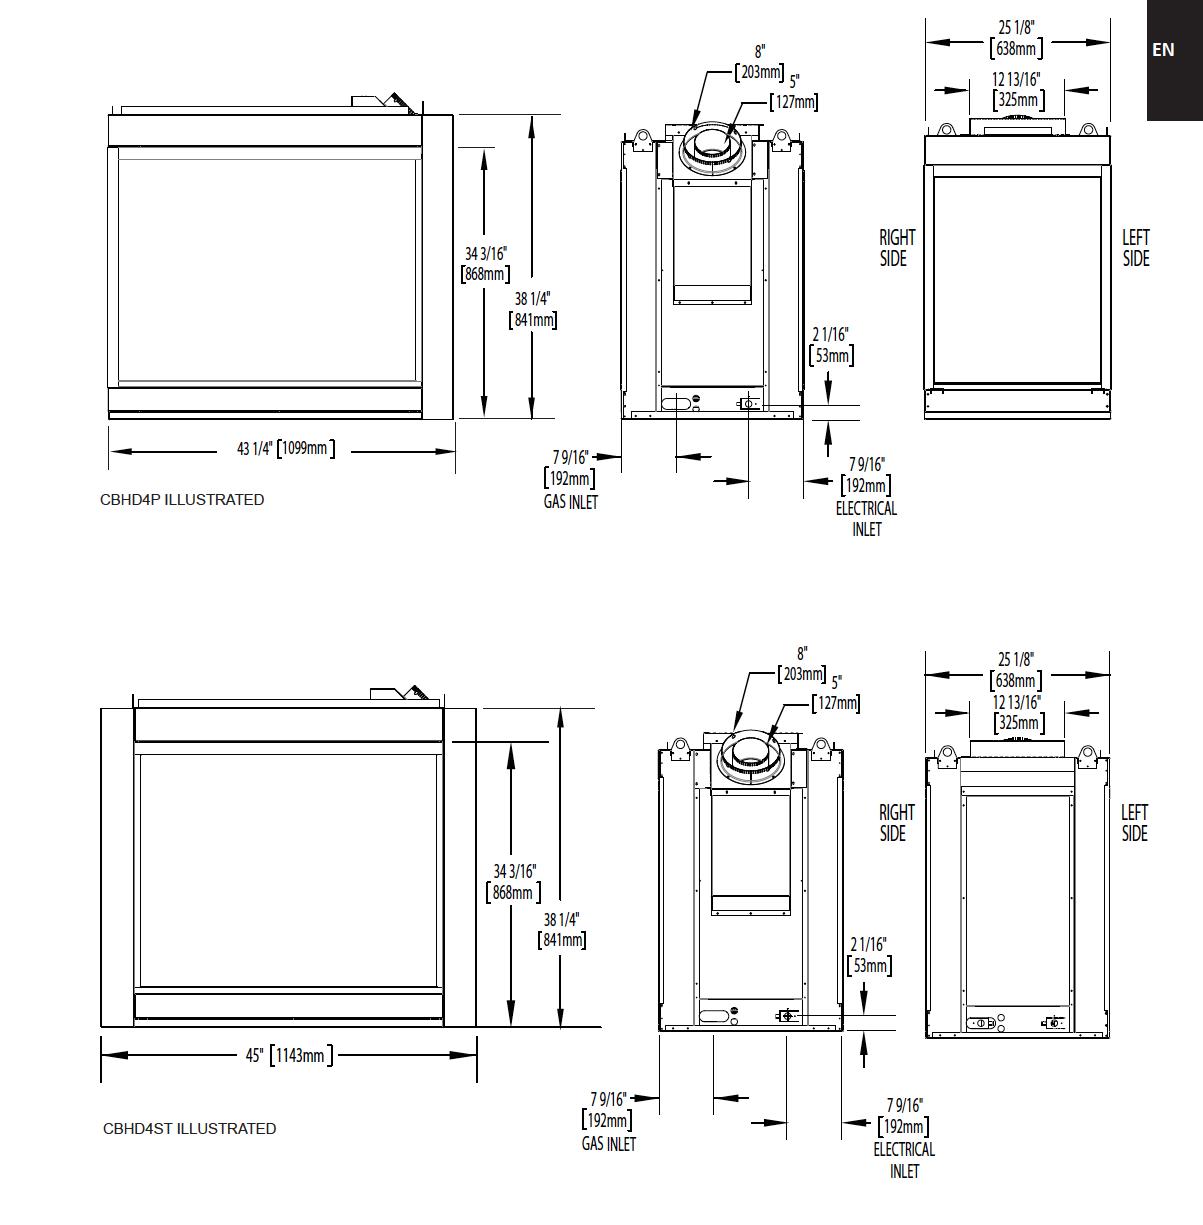 richmond water heater installation manual